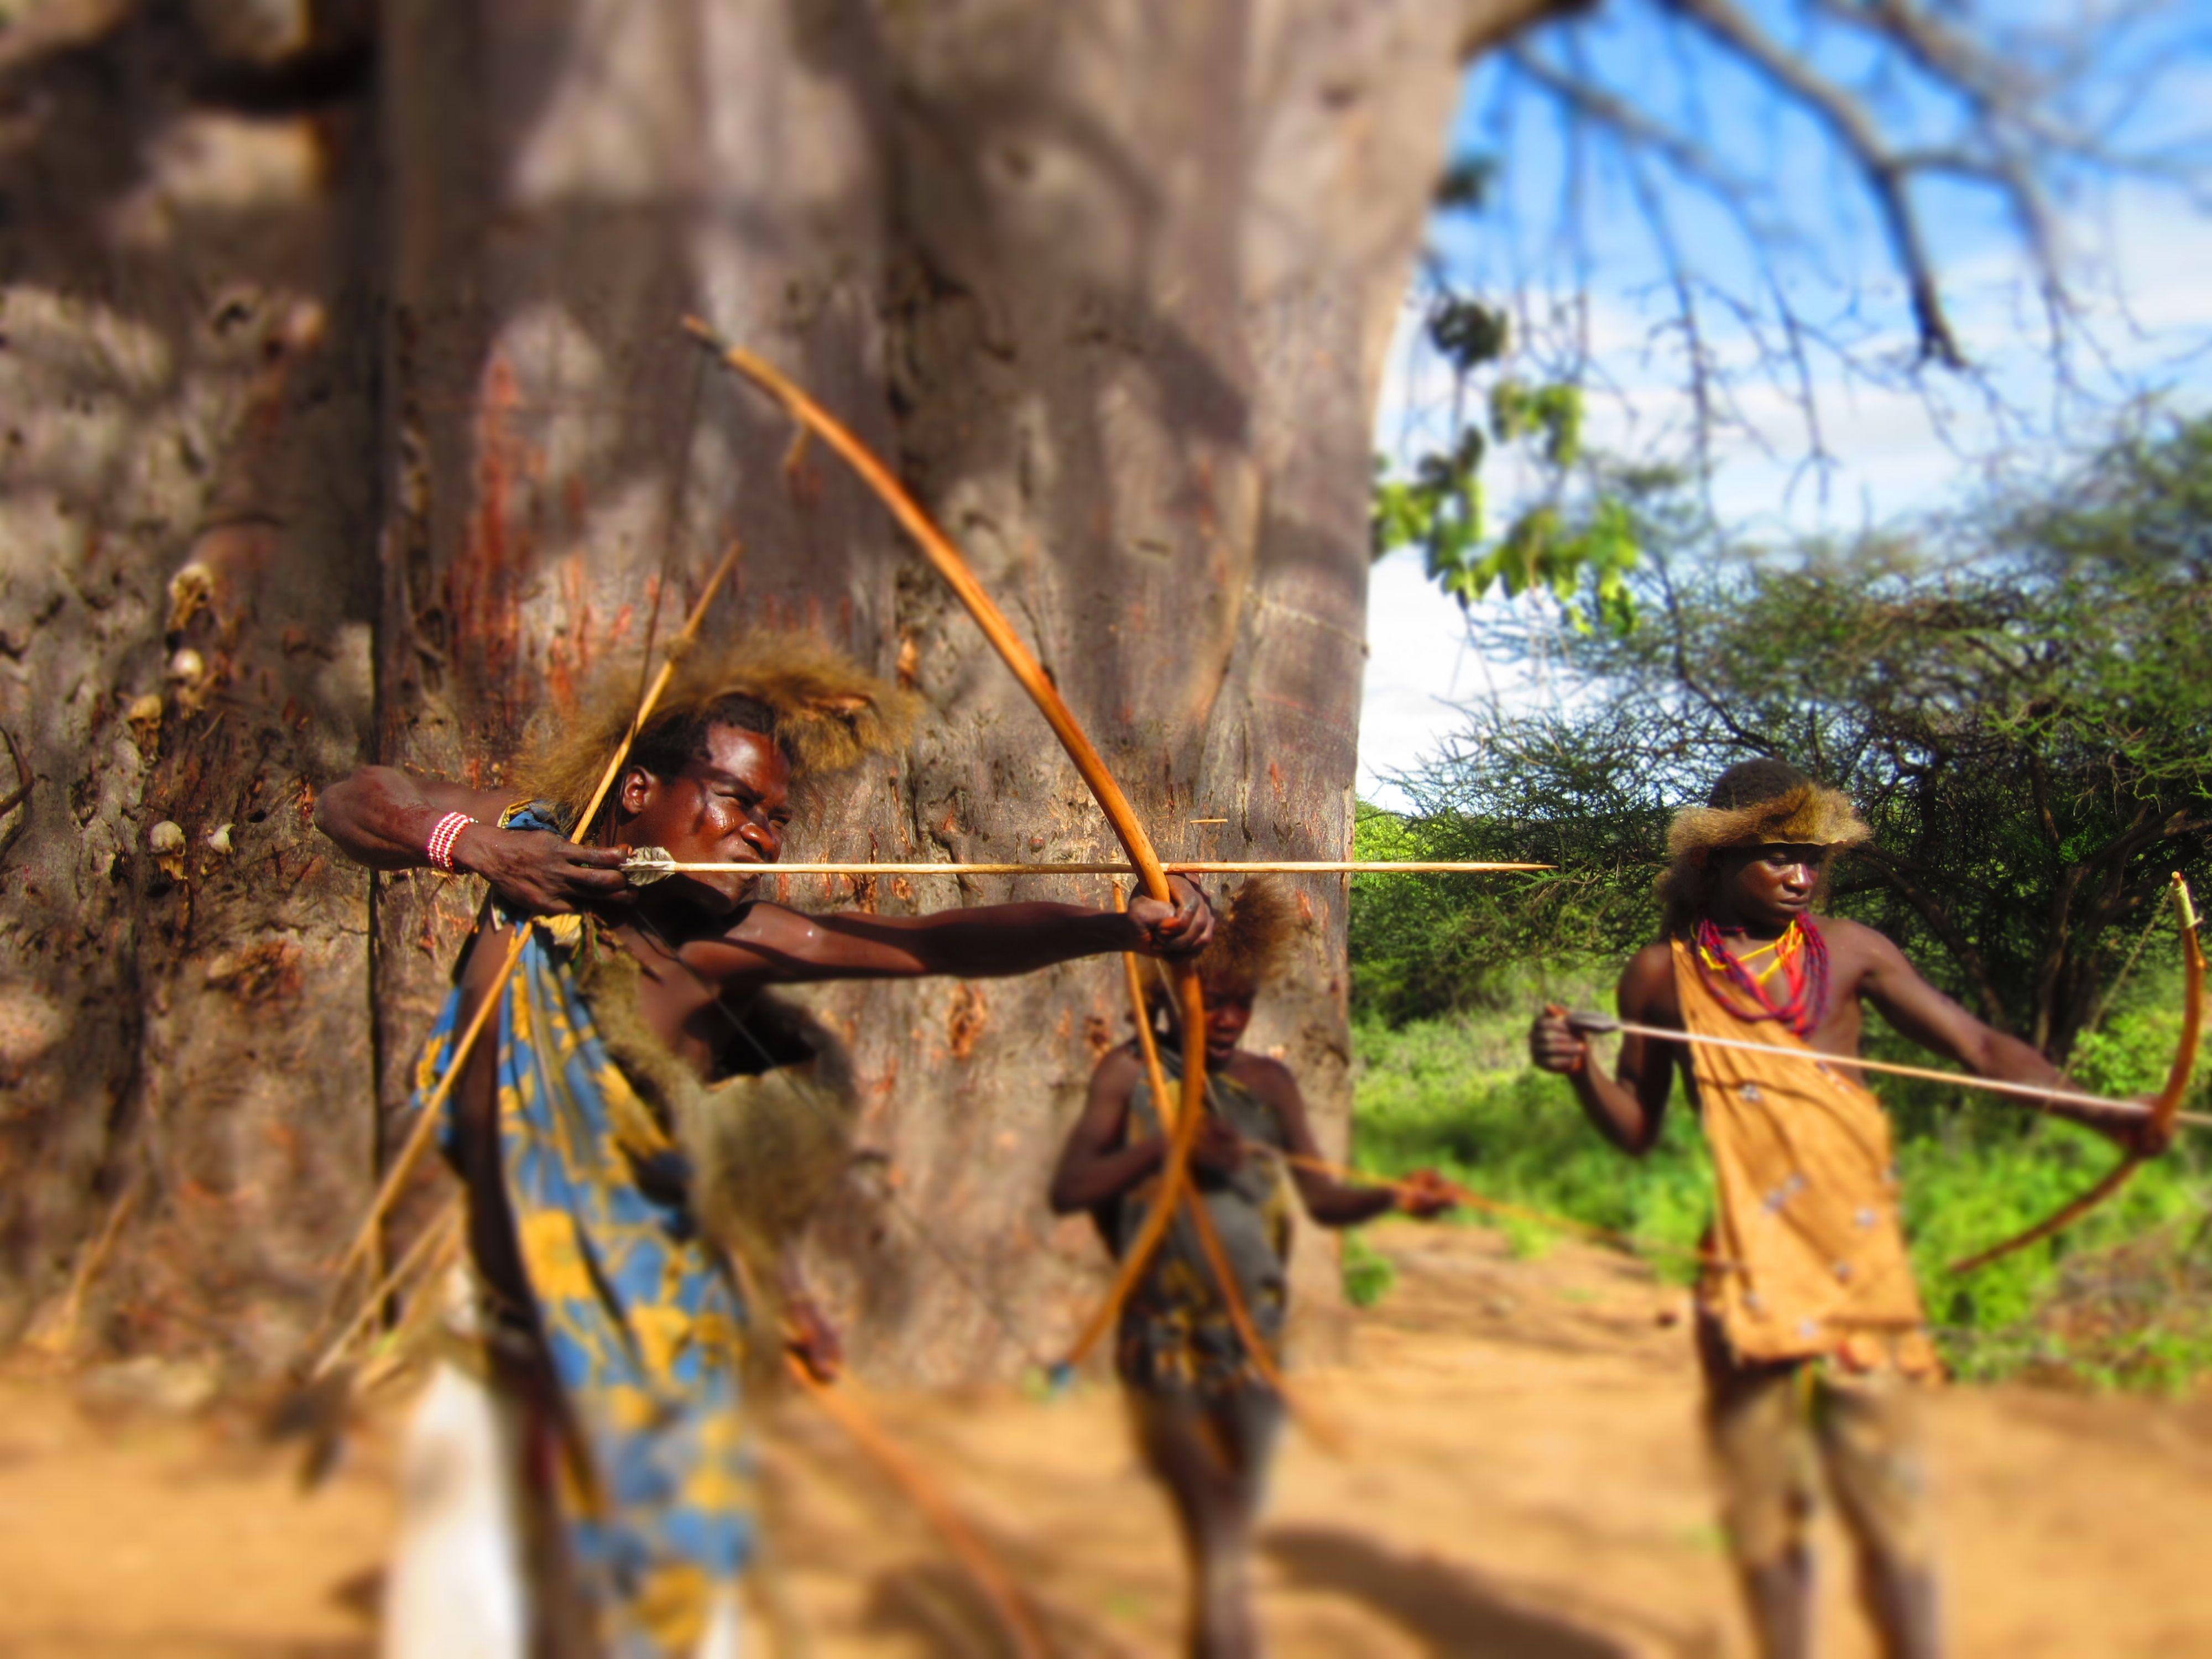 Tracking the Hadzabe: One of Africa's Last Nomadic Bush Tribes